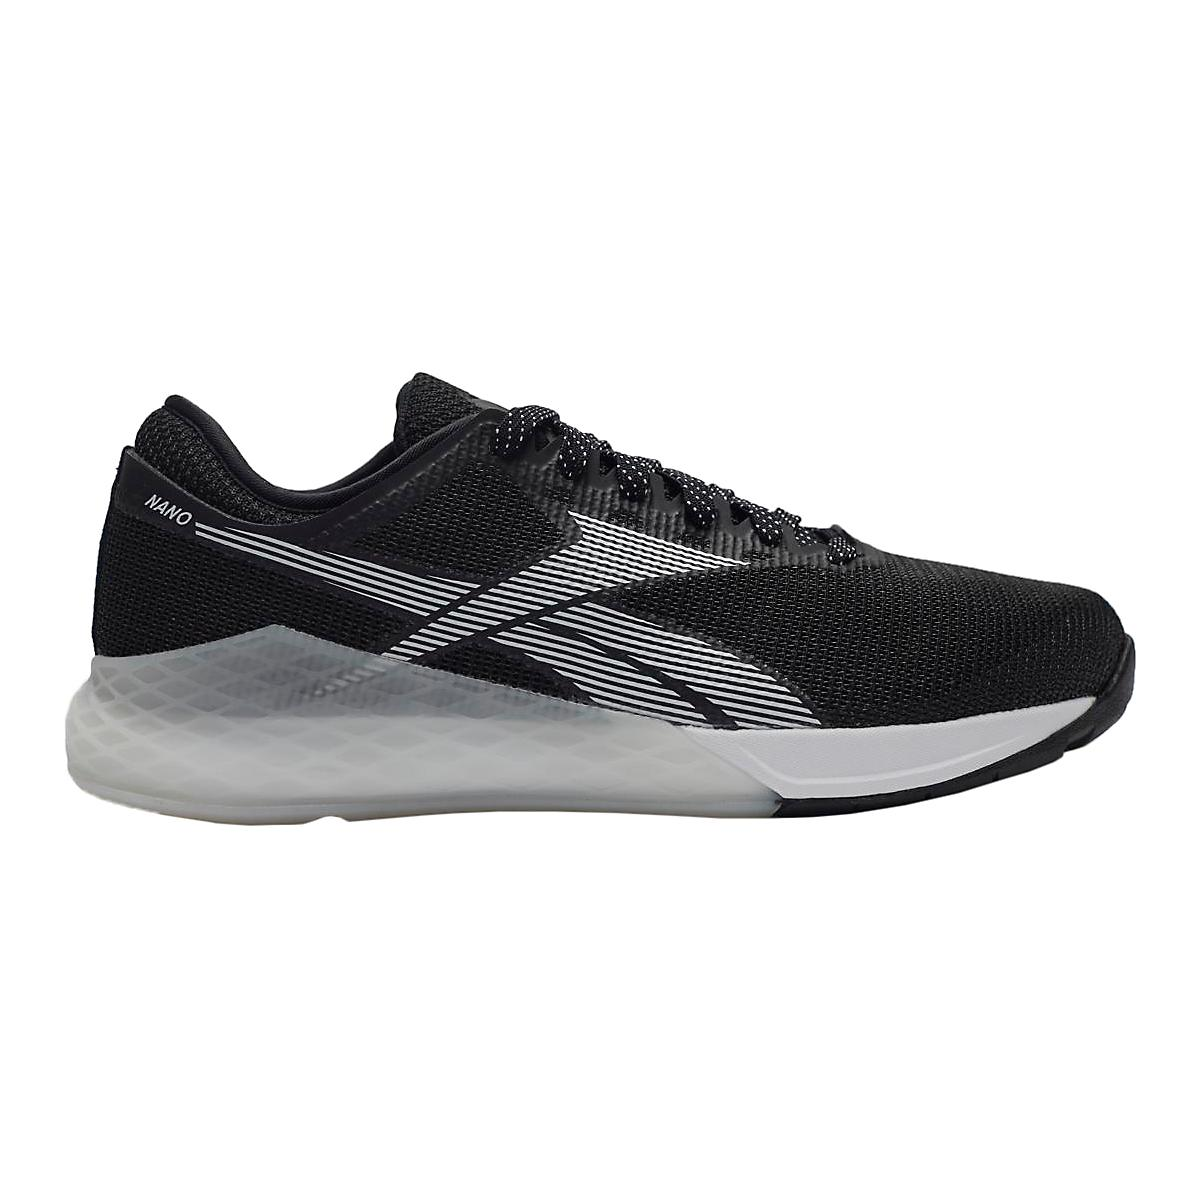 mirar televisión Cañón Engaño  Womens Reebok CrossFit Nano 9 Cross Training Shoe at Road Runner Sports